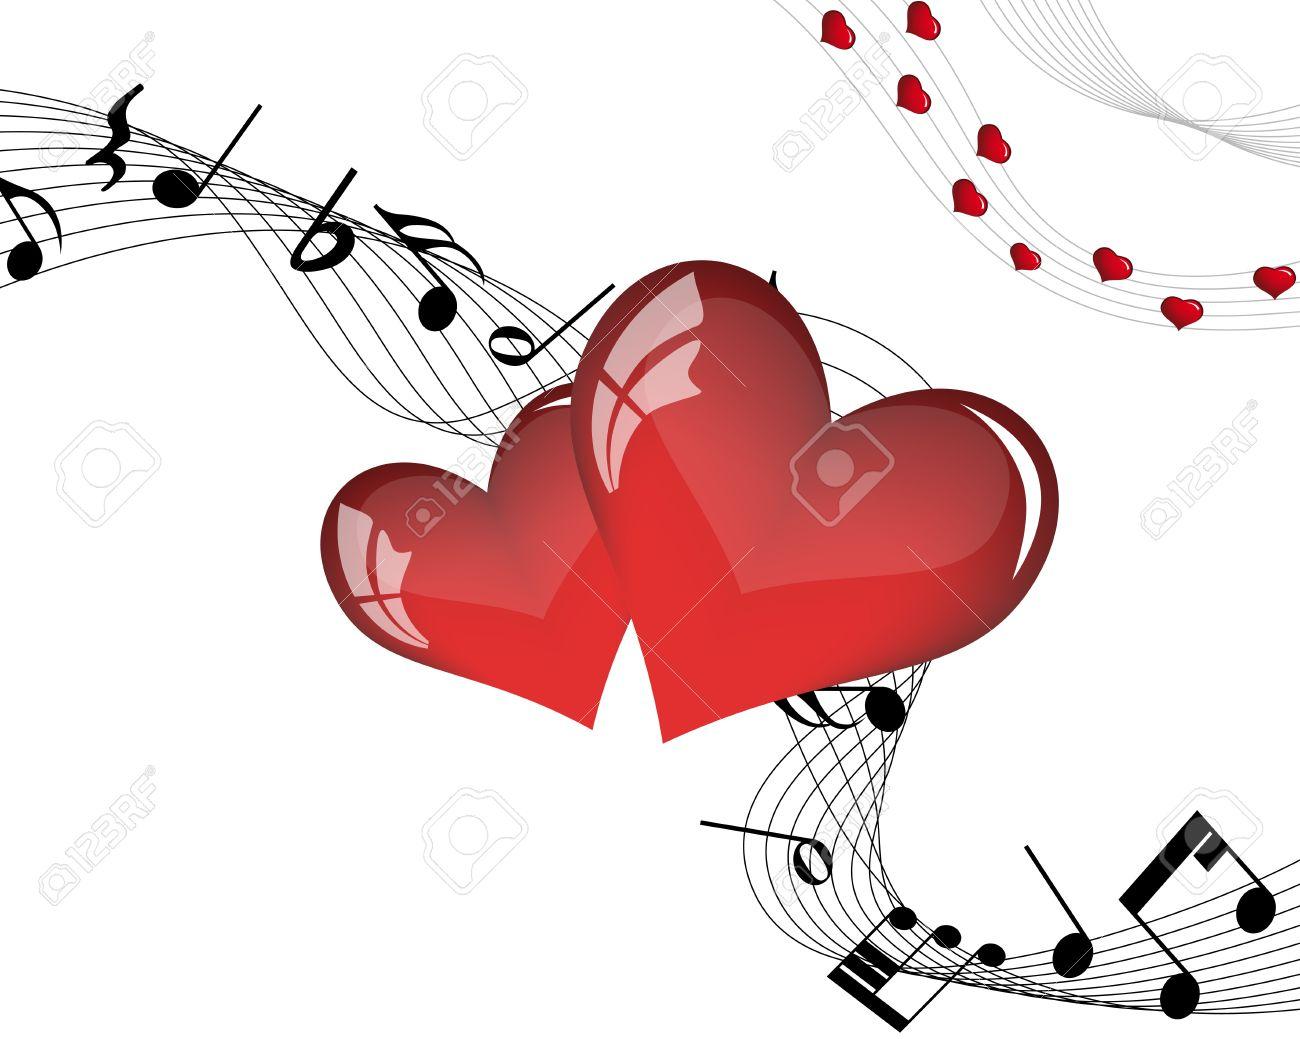 Abstract Valentine days background frame. Vector illustration. - 12284781